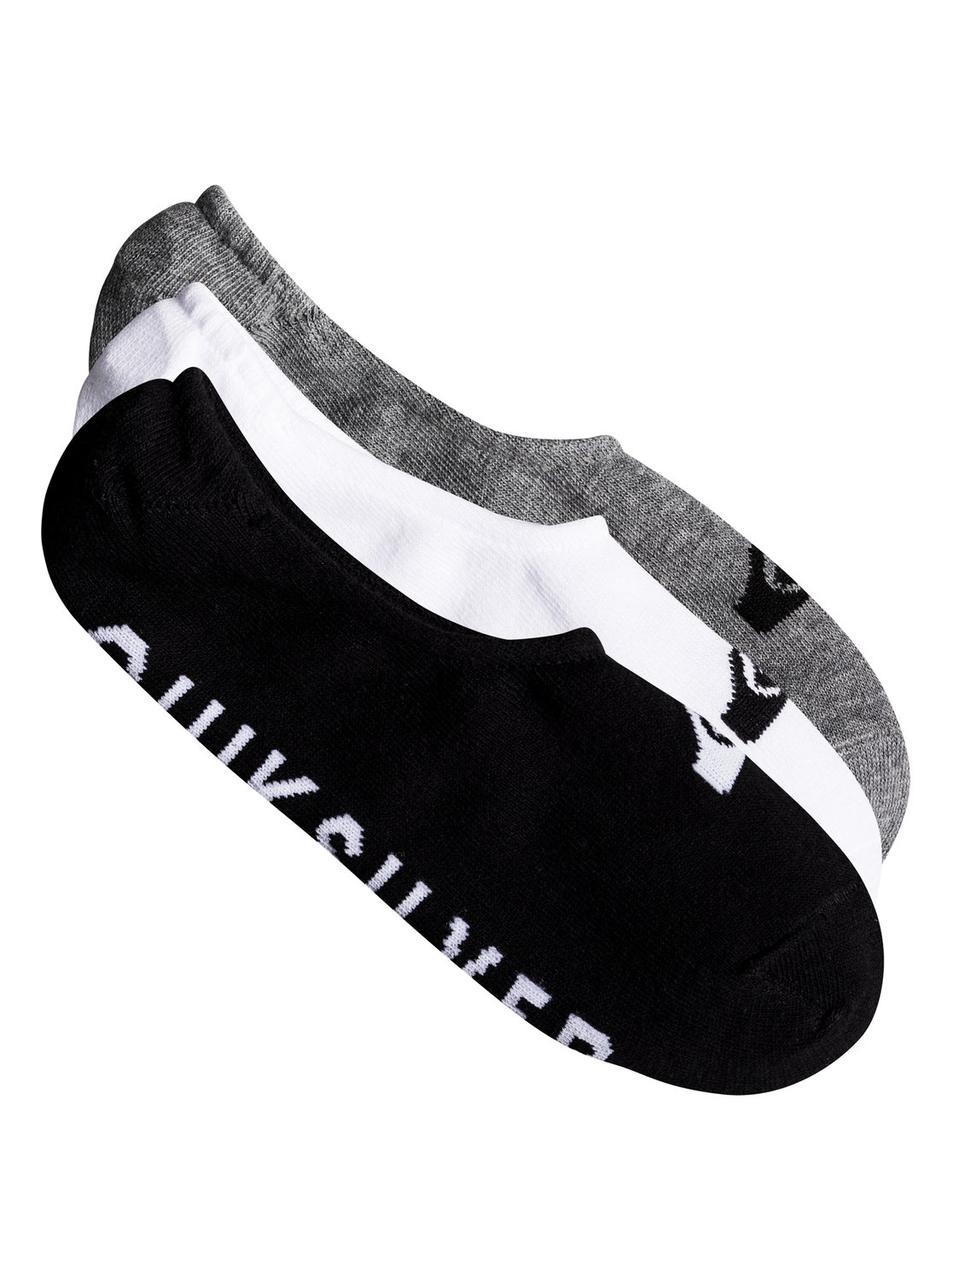 Носки  мужские Quiksilver Liner ( 3 pairs )